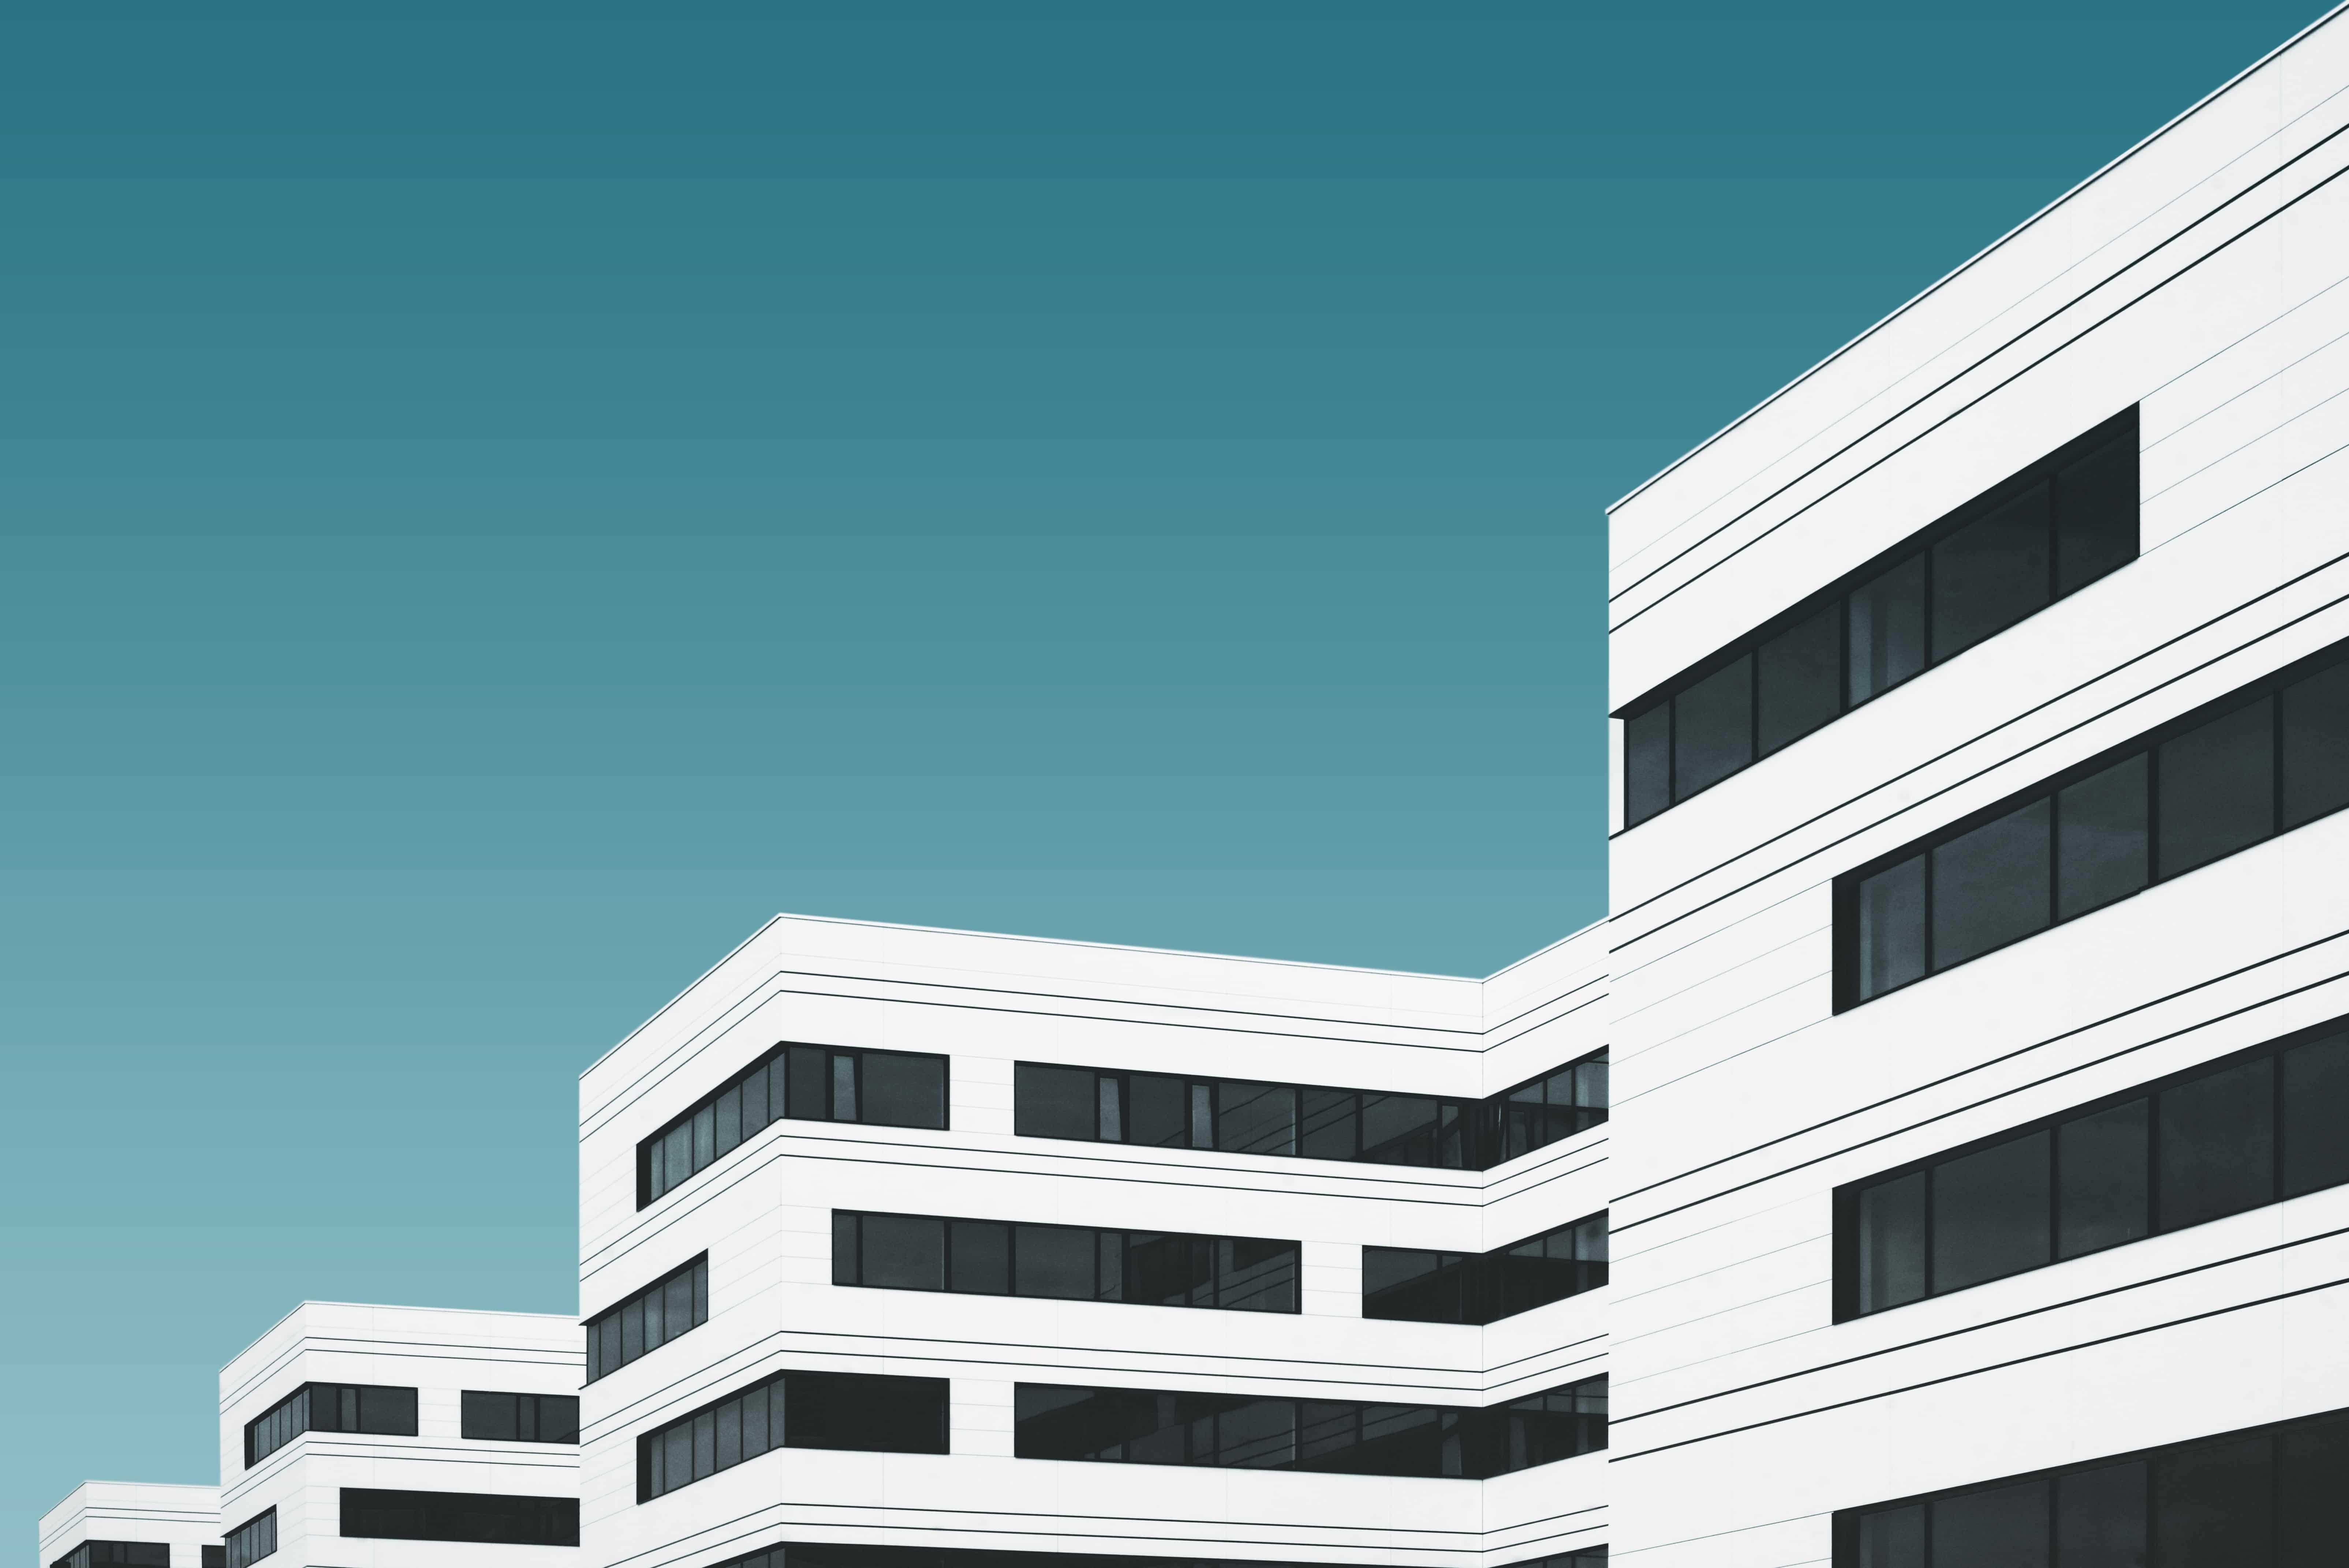 hospital buildings